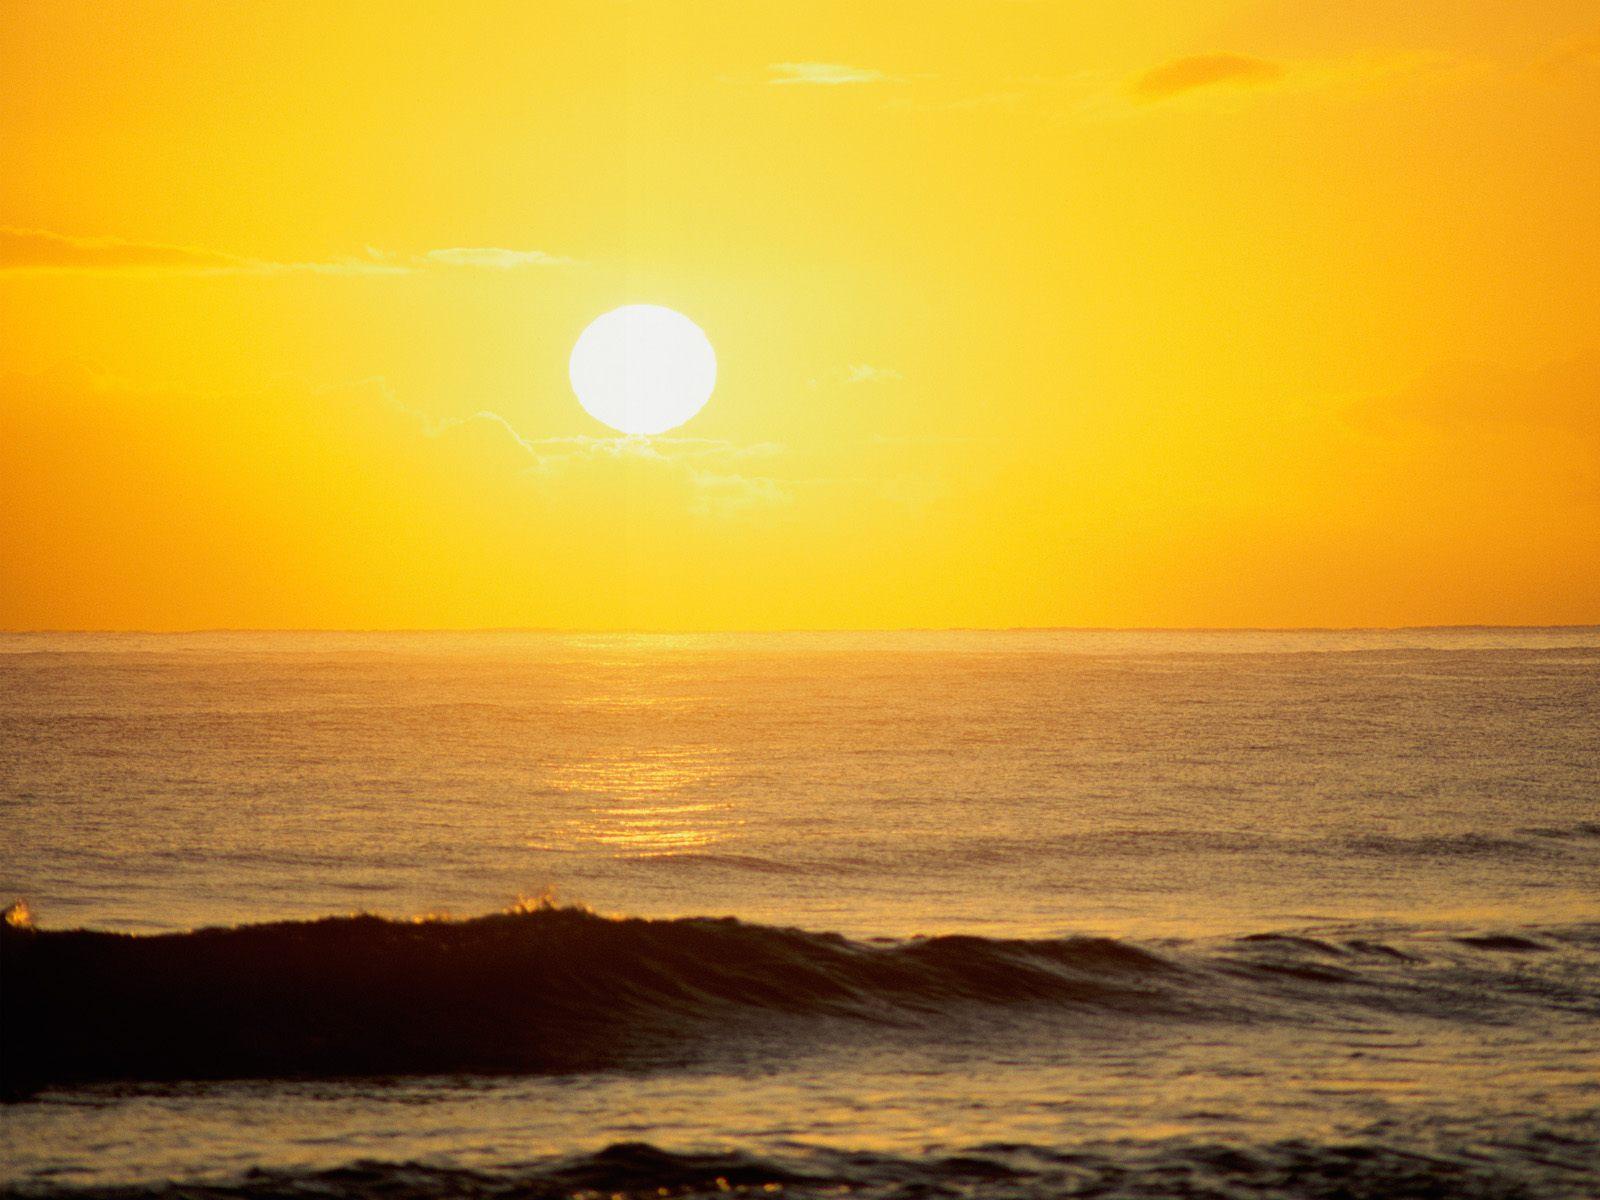 http://2.bp.blogspot.com/-Olq19mNTDVw/T9F28yCJg0I/AAAAAAAABII/qut3ea64cZY/s1600/Sun.jpg